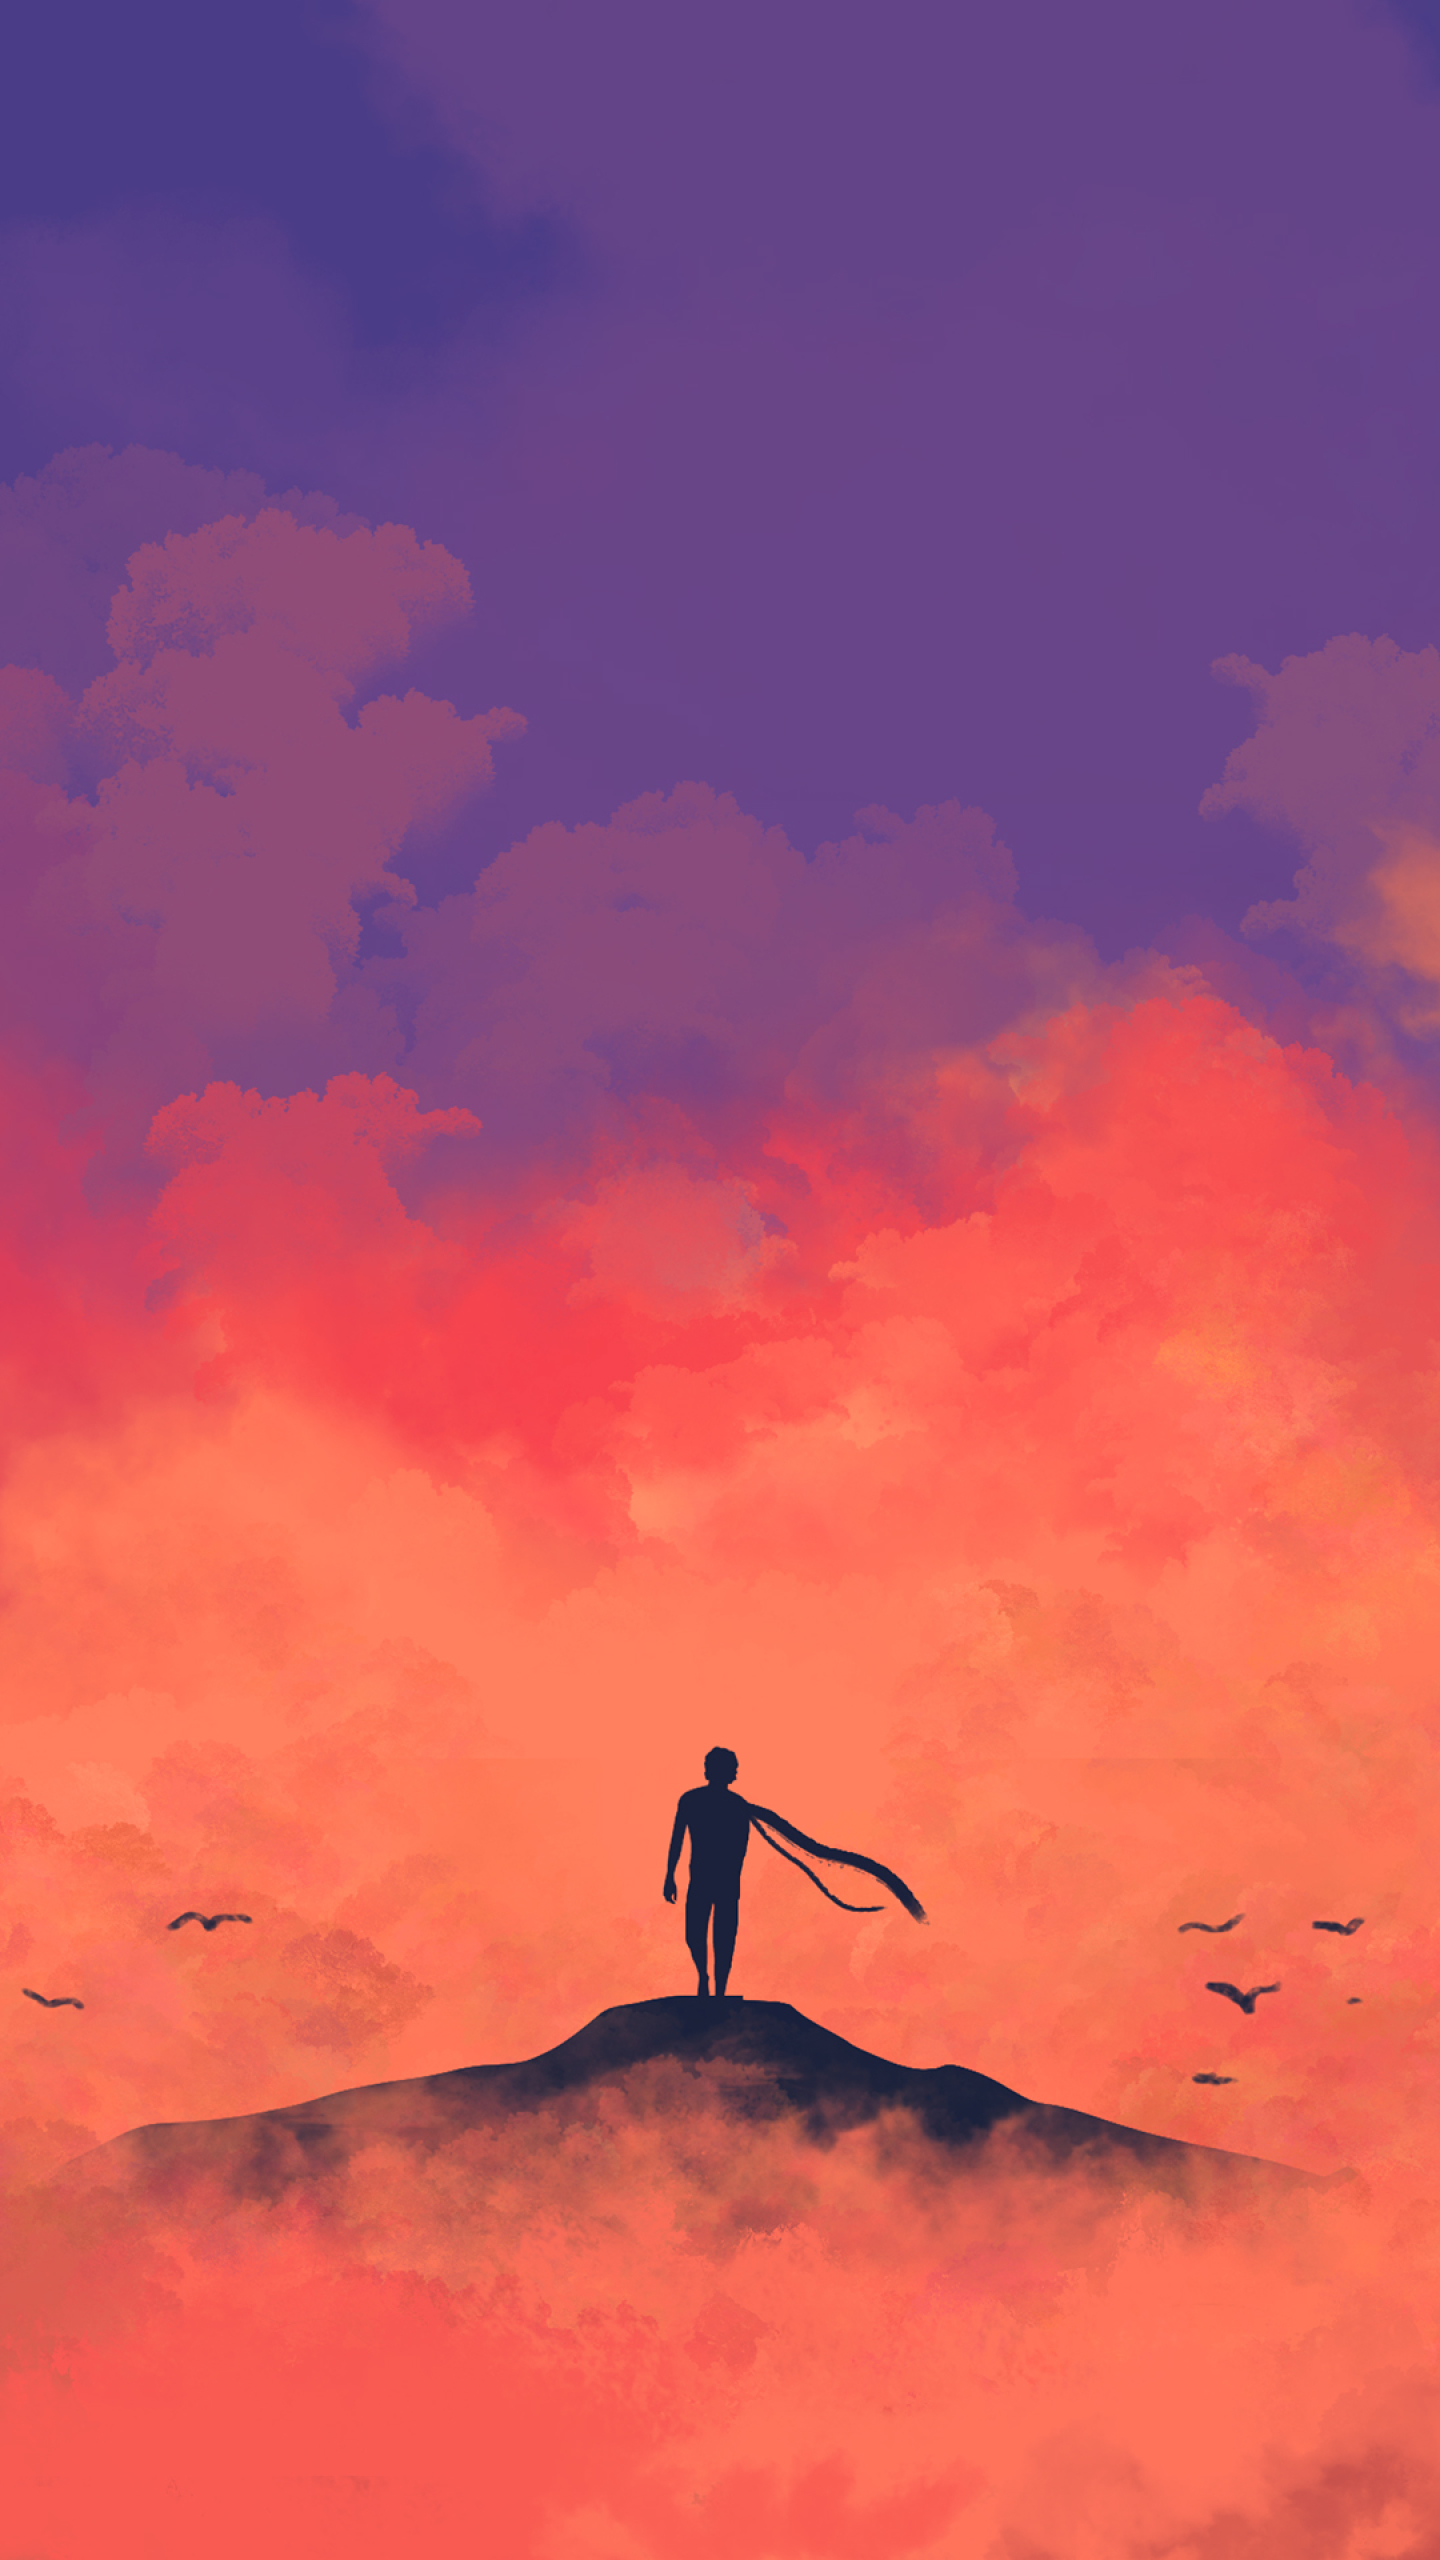 Anime Minimalism, HD 4K Wallpaper